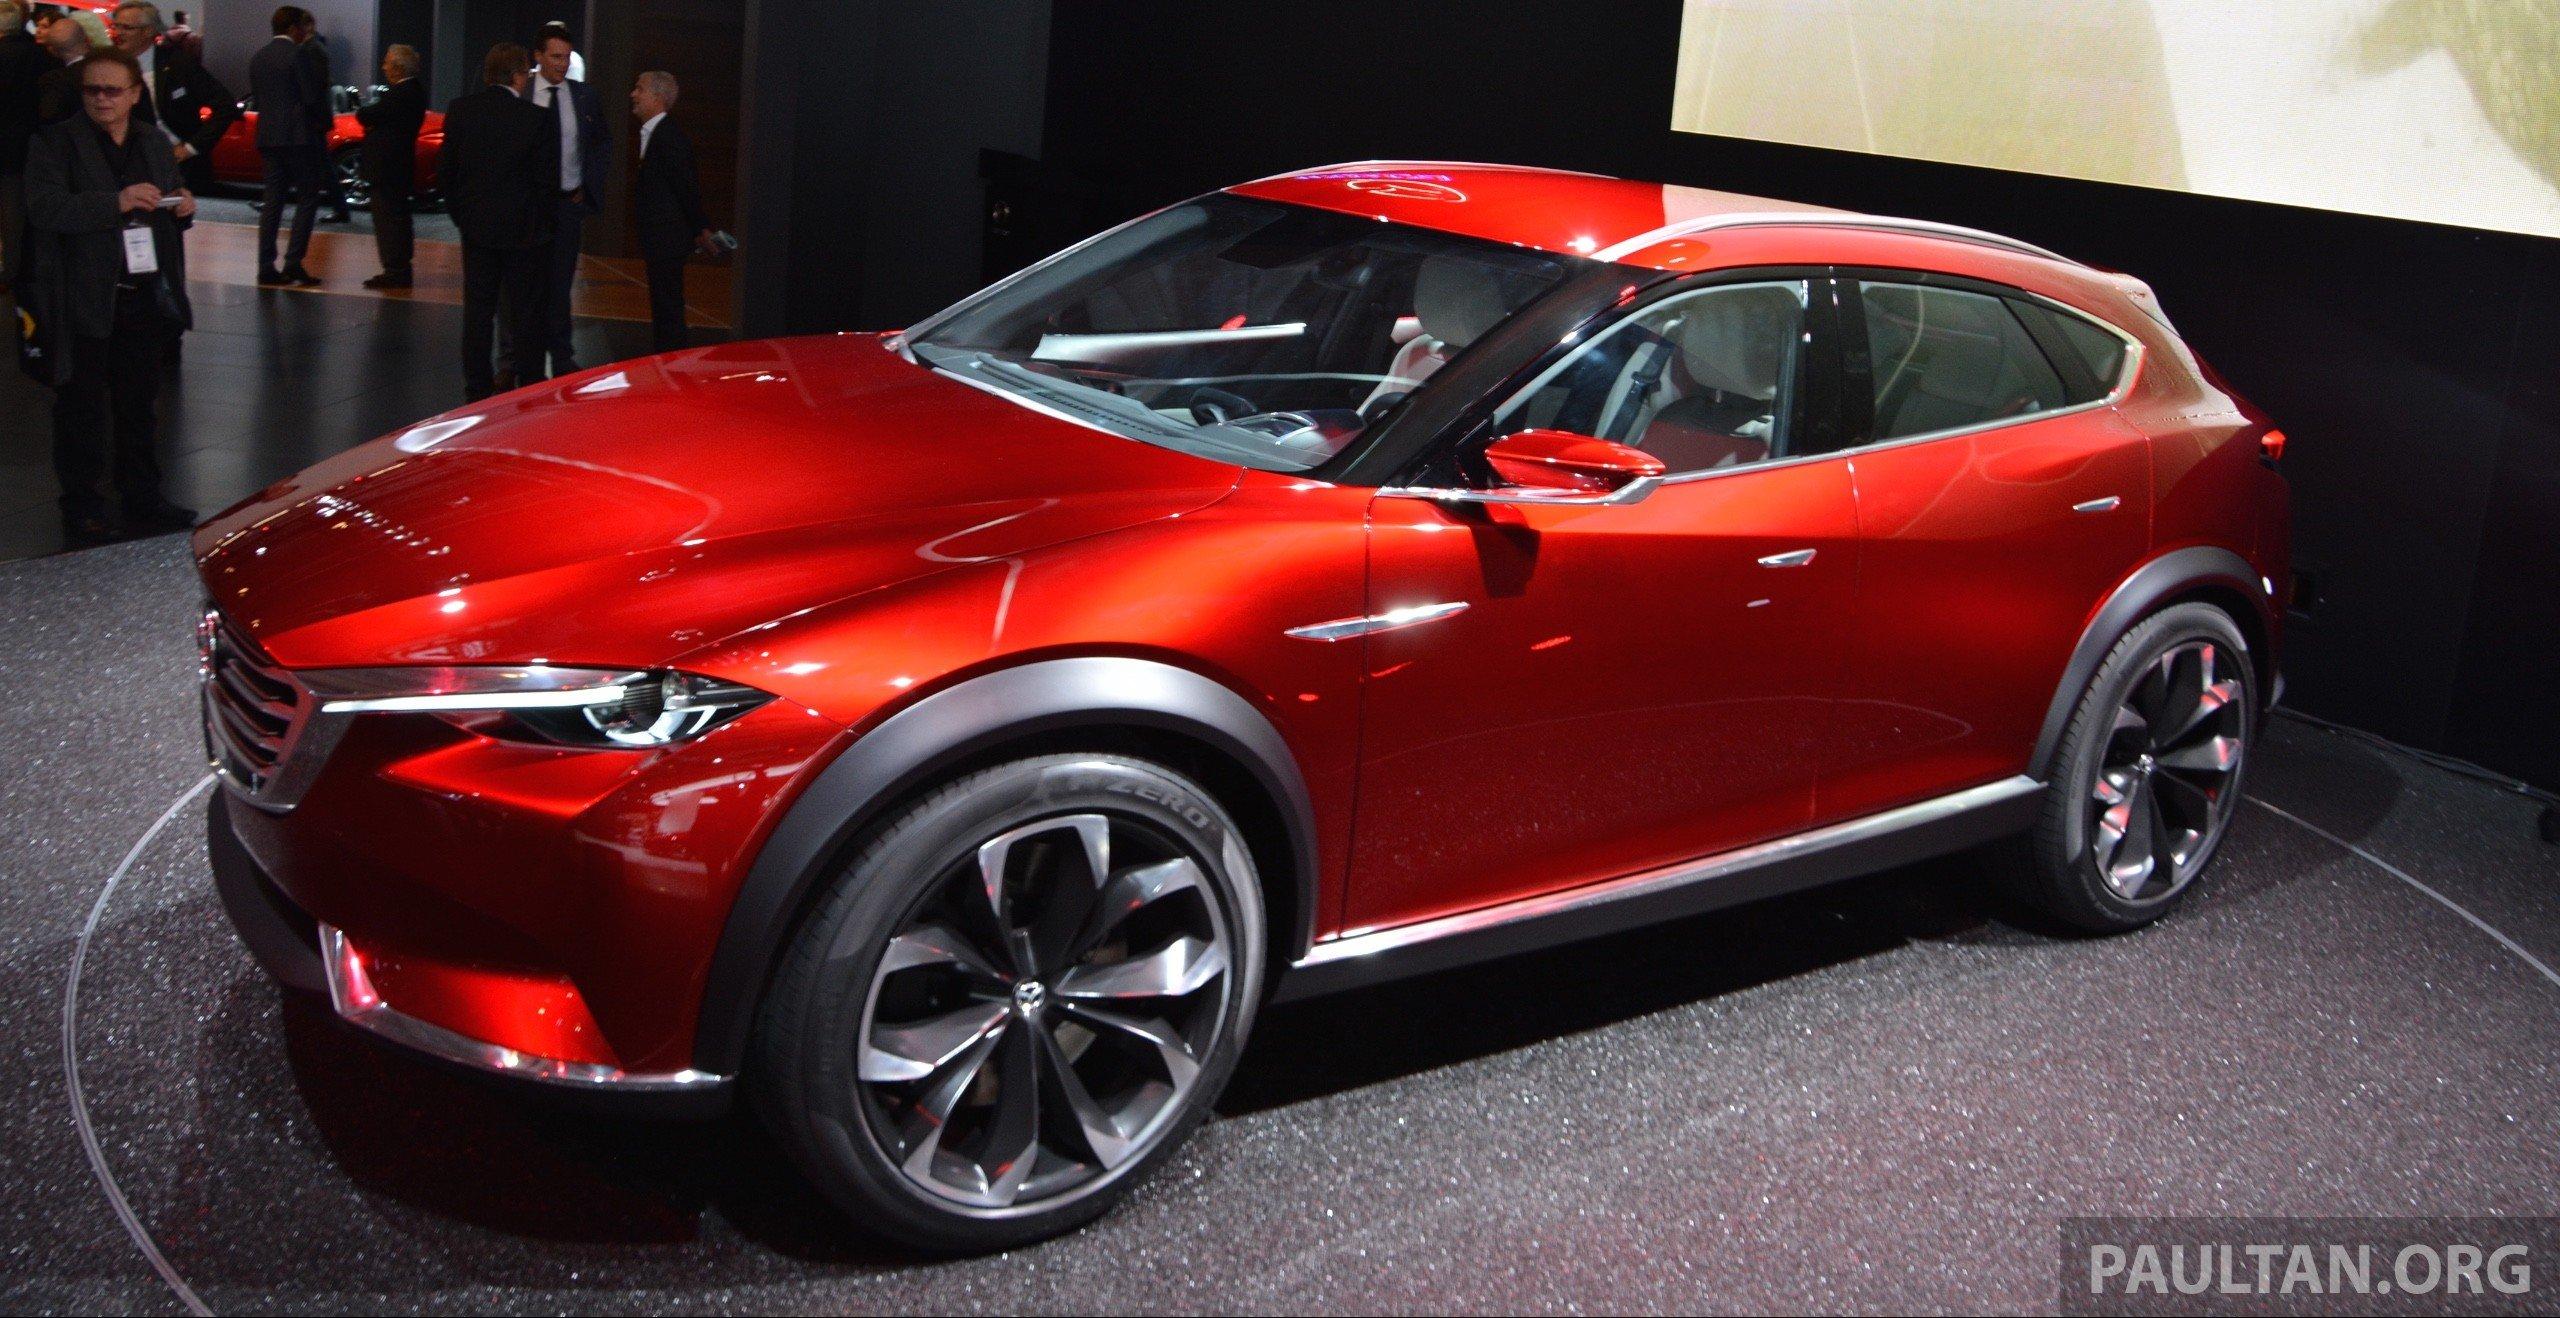 https://s2.paultan.org/image/2015/09/Mazda-Koeru-Frankfurt-23-e1442496712556.jpg